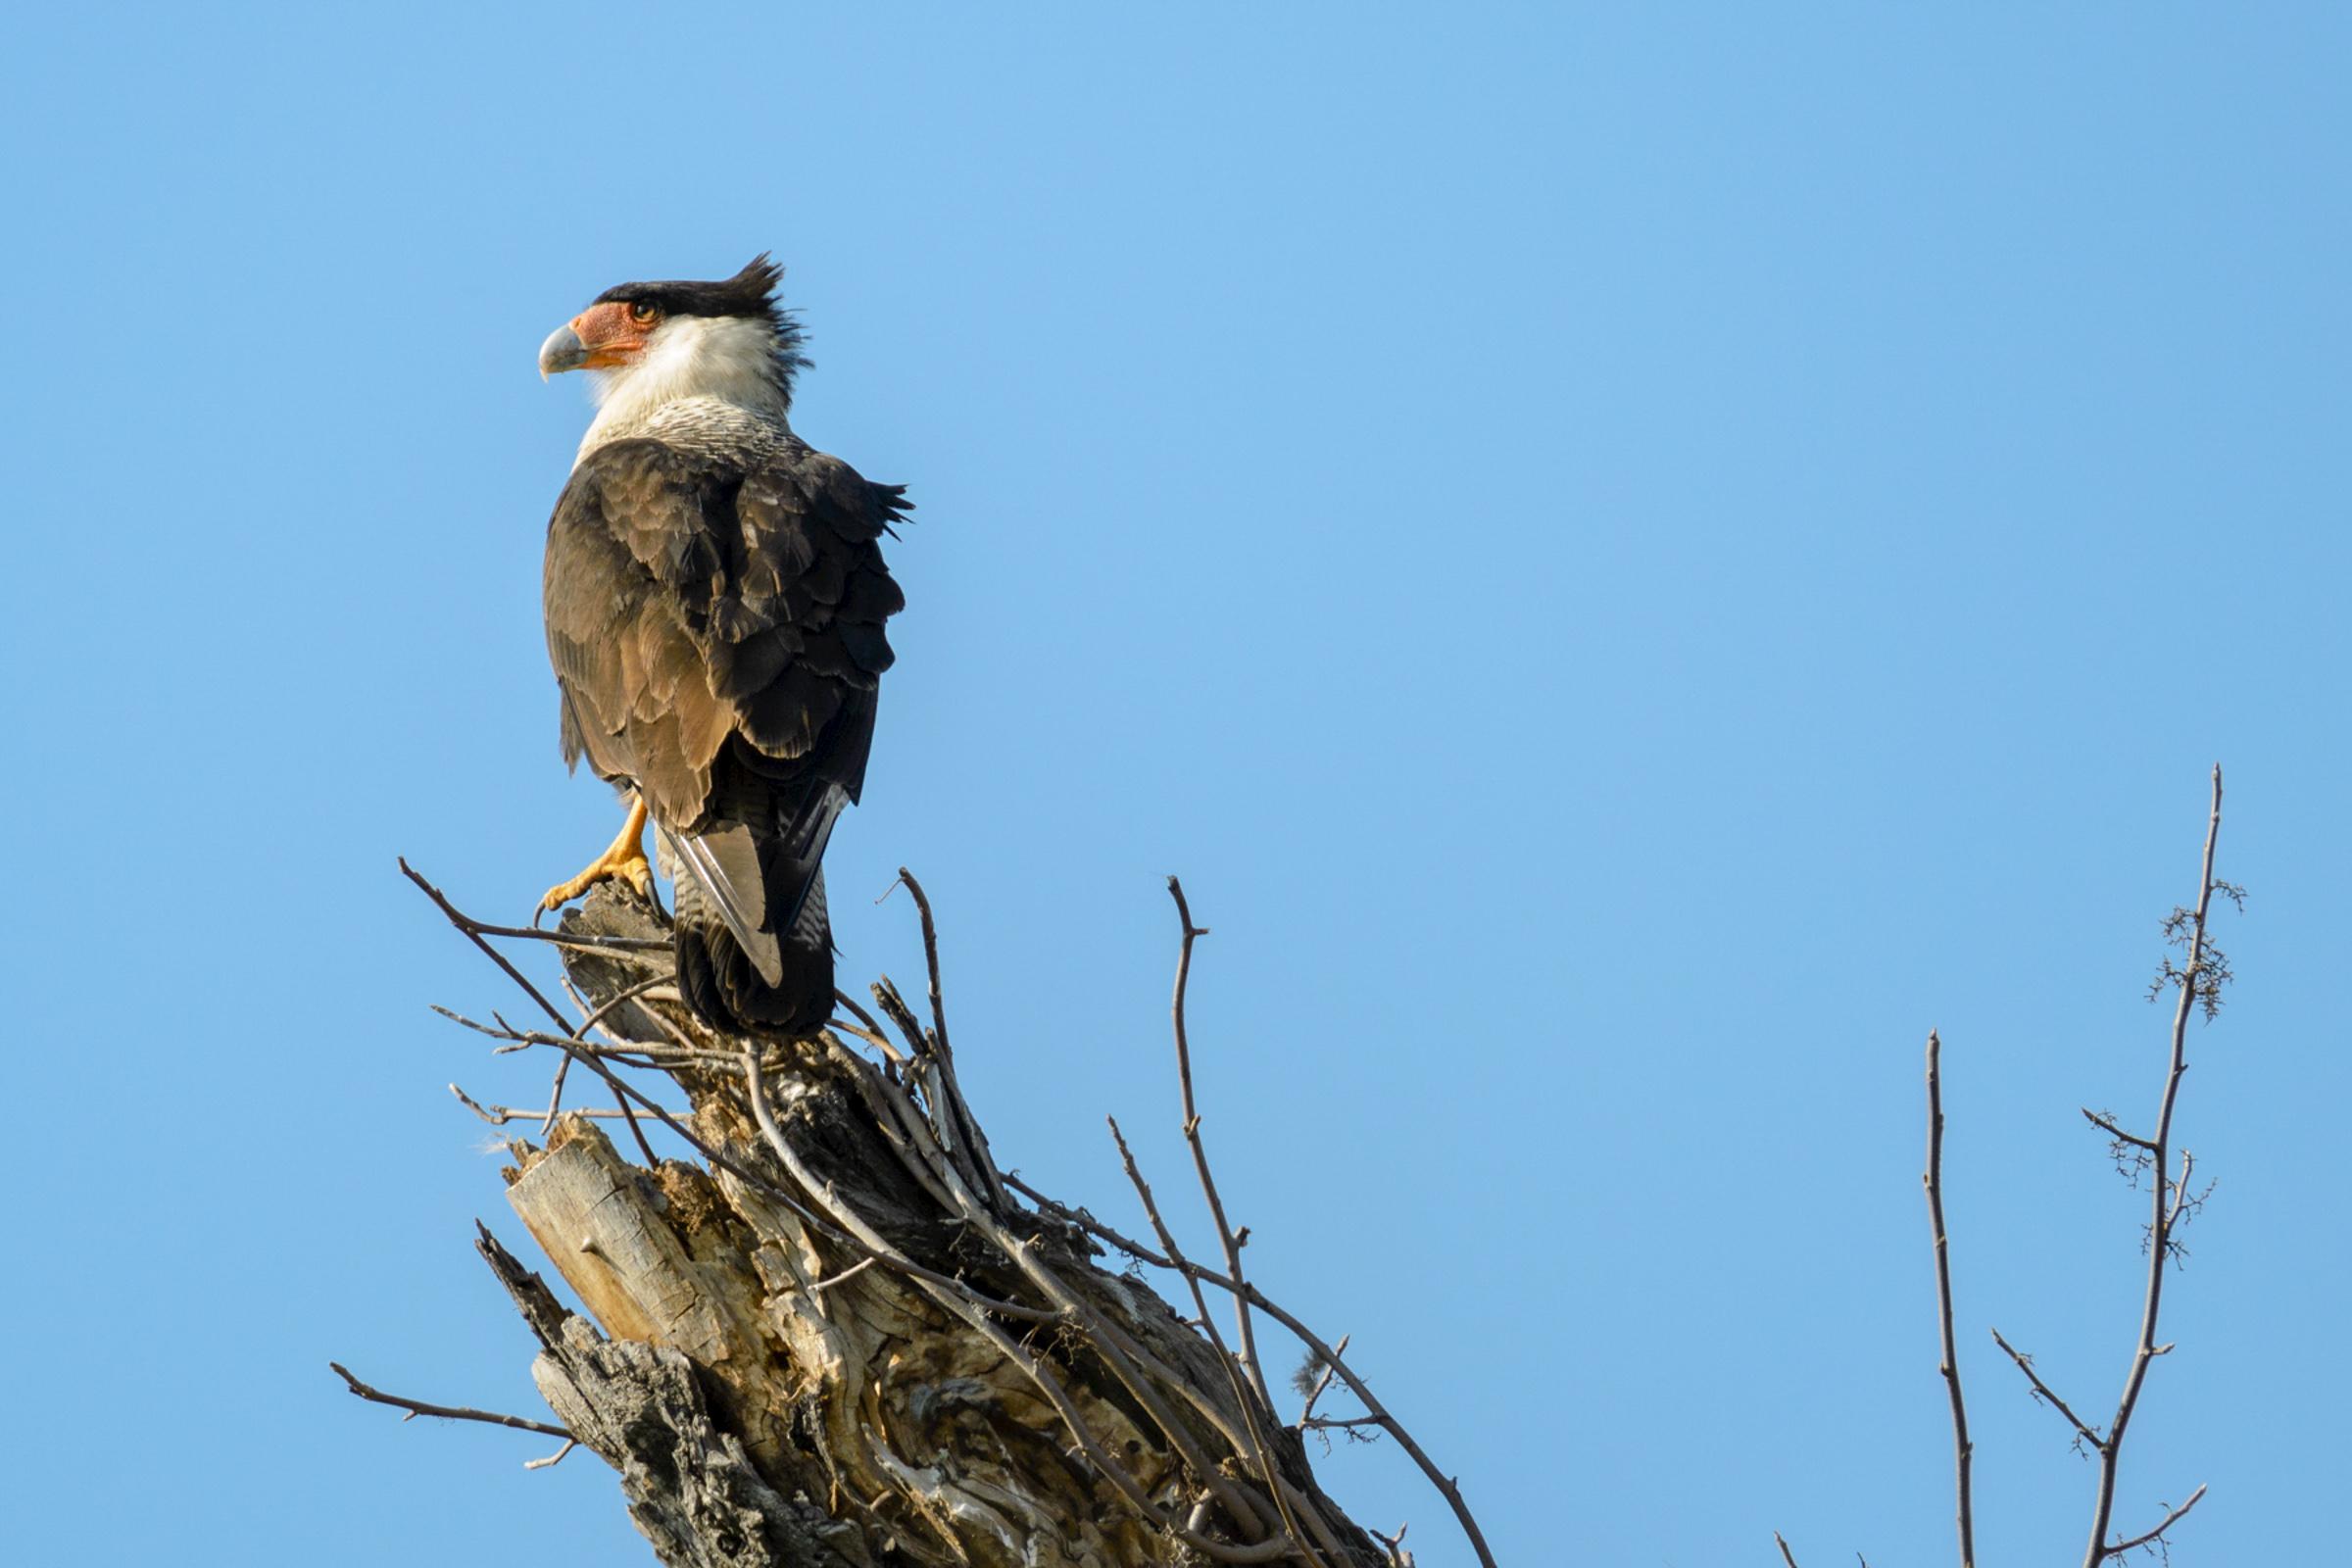 Crested Caracara. Photo: Ted Maeurer/Audubon Photography Awards.